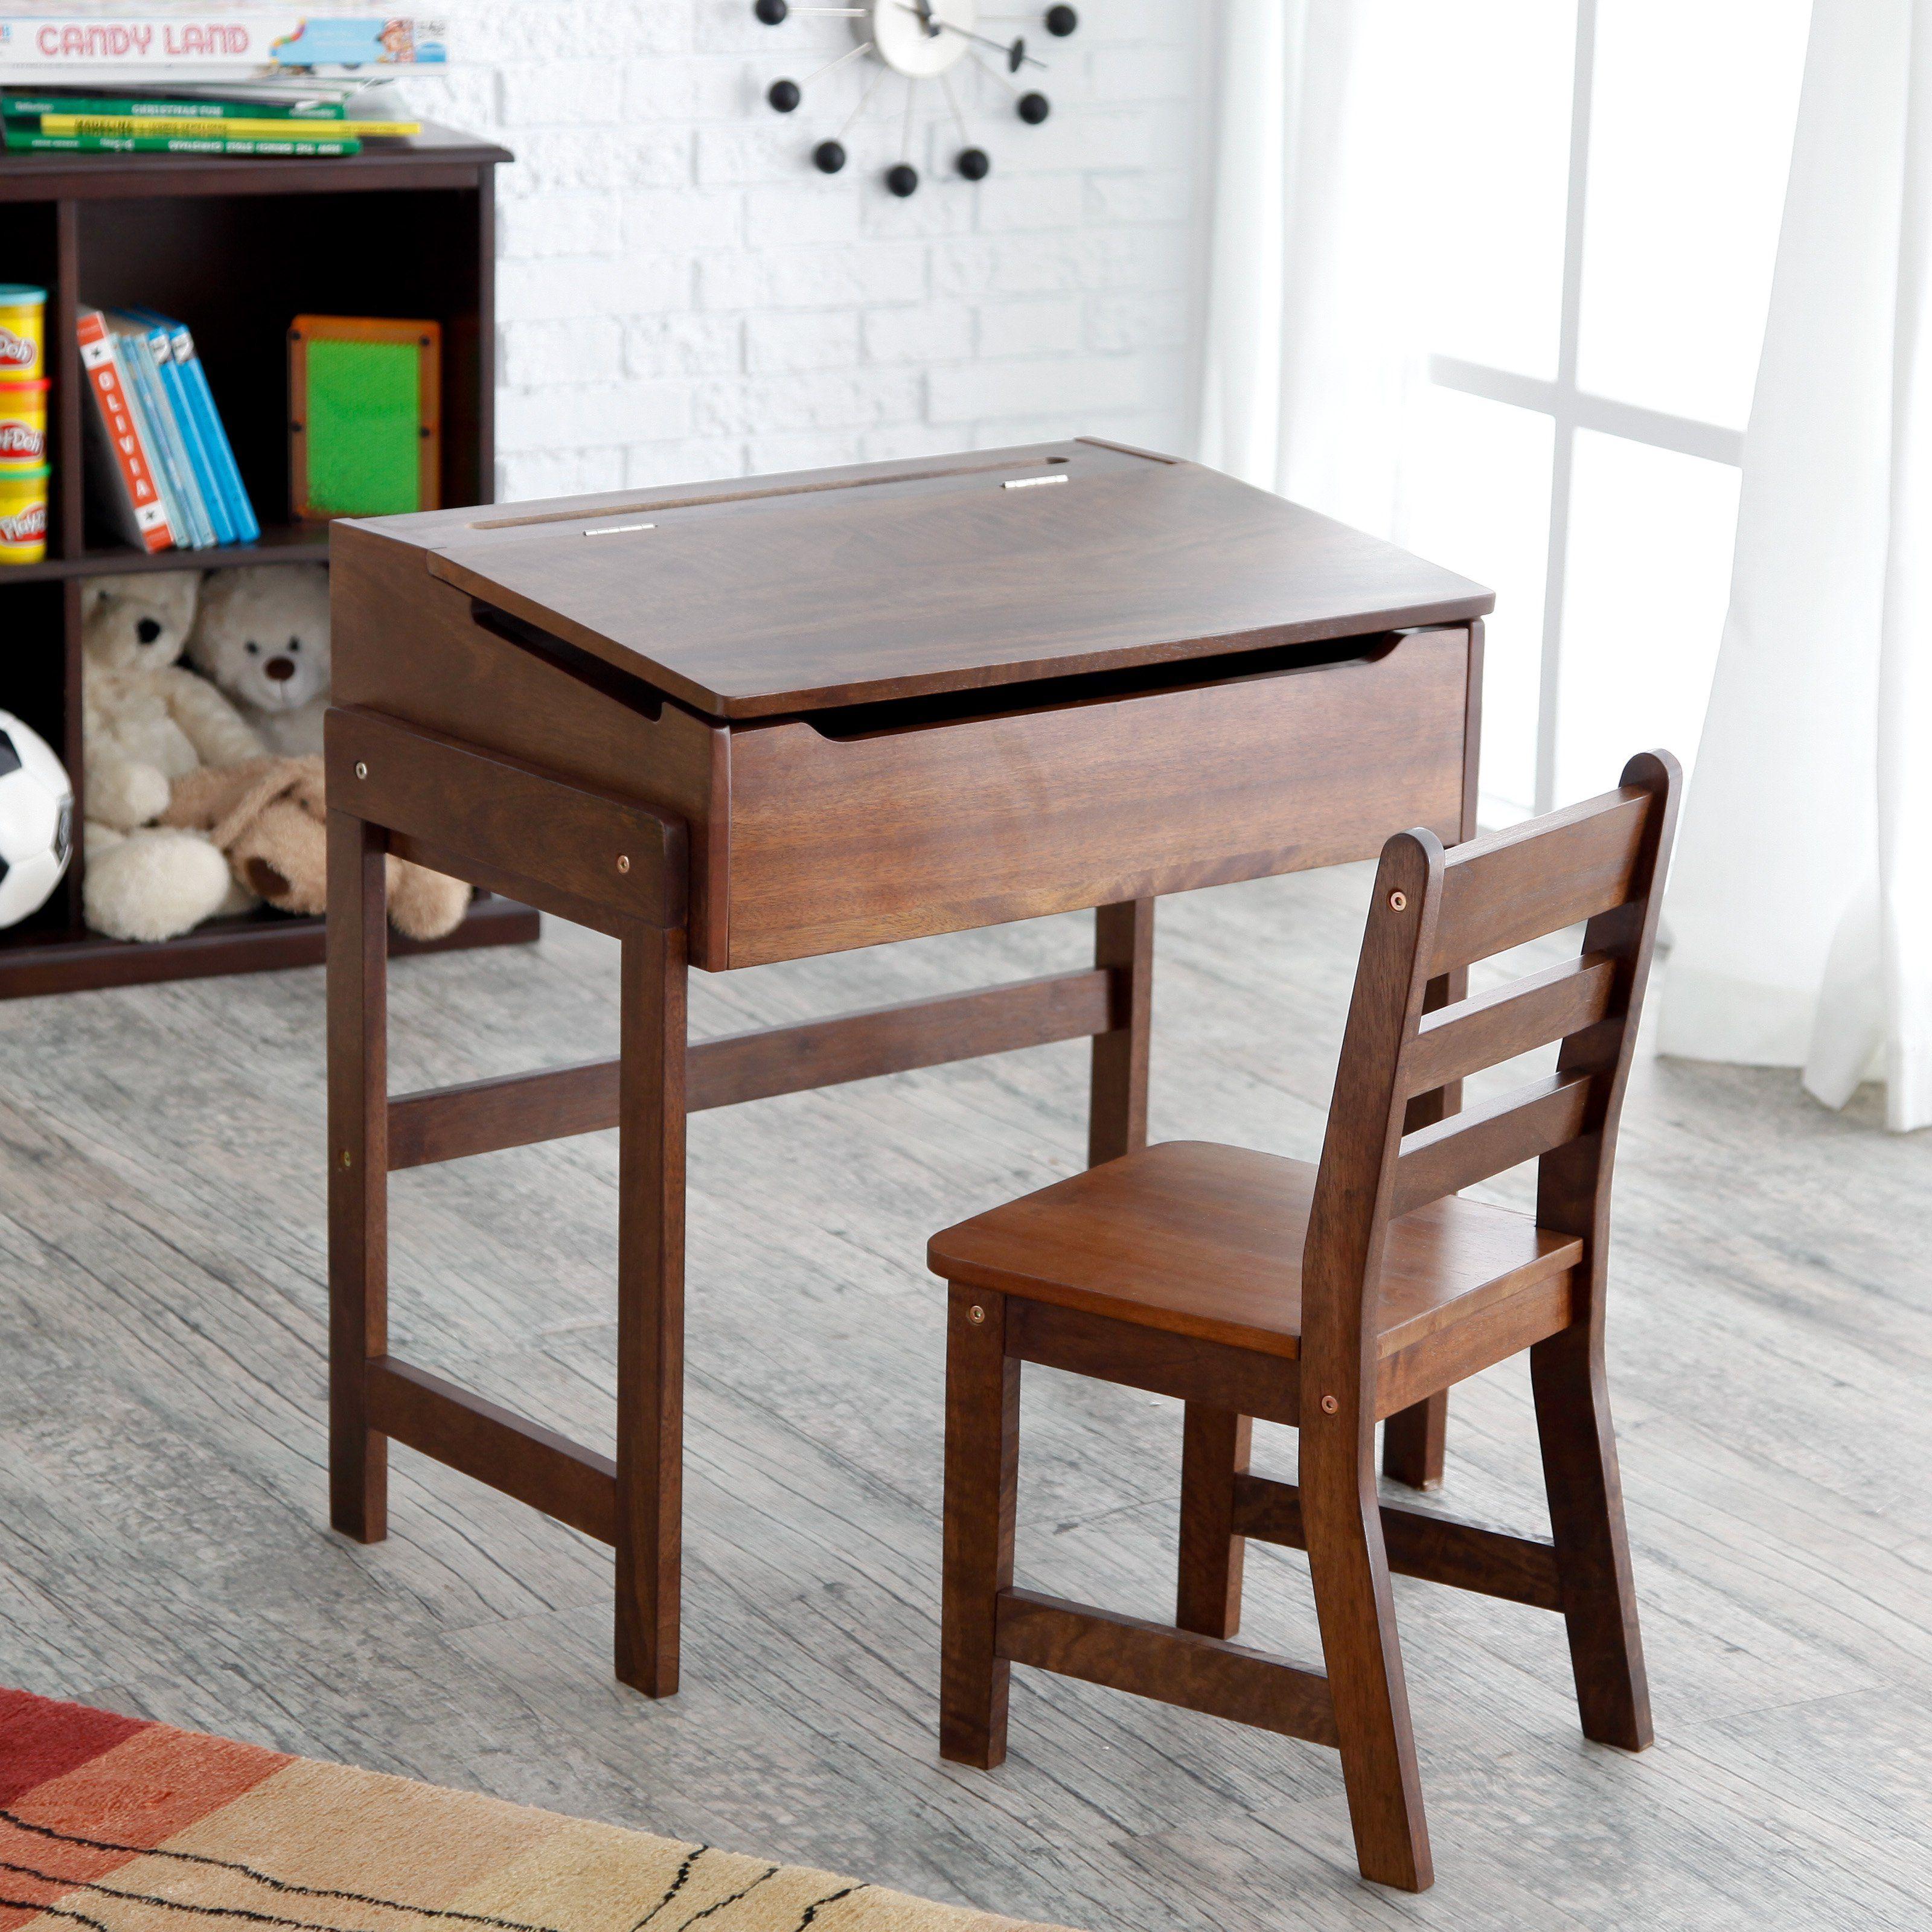 Schoolhouse Desk And Chair Set Walnut Www Hayneedle Com Desk And Chair Set Childrens Desk And Chair Best Home Office Desk